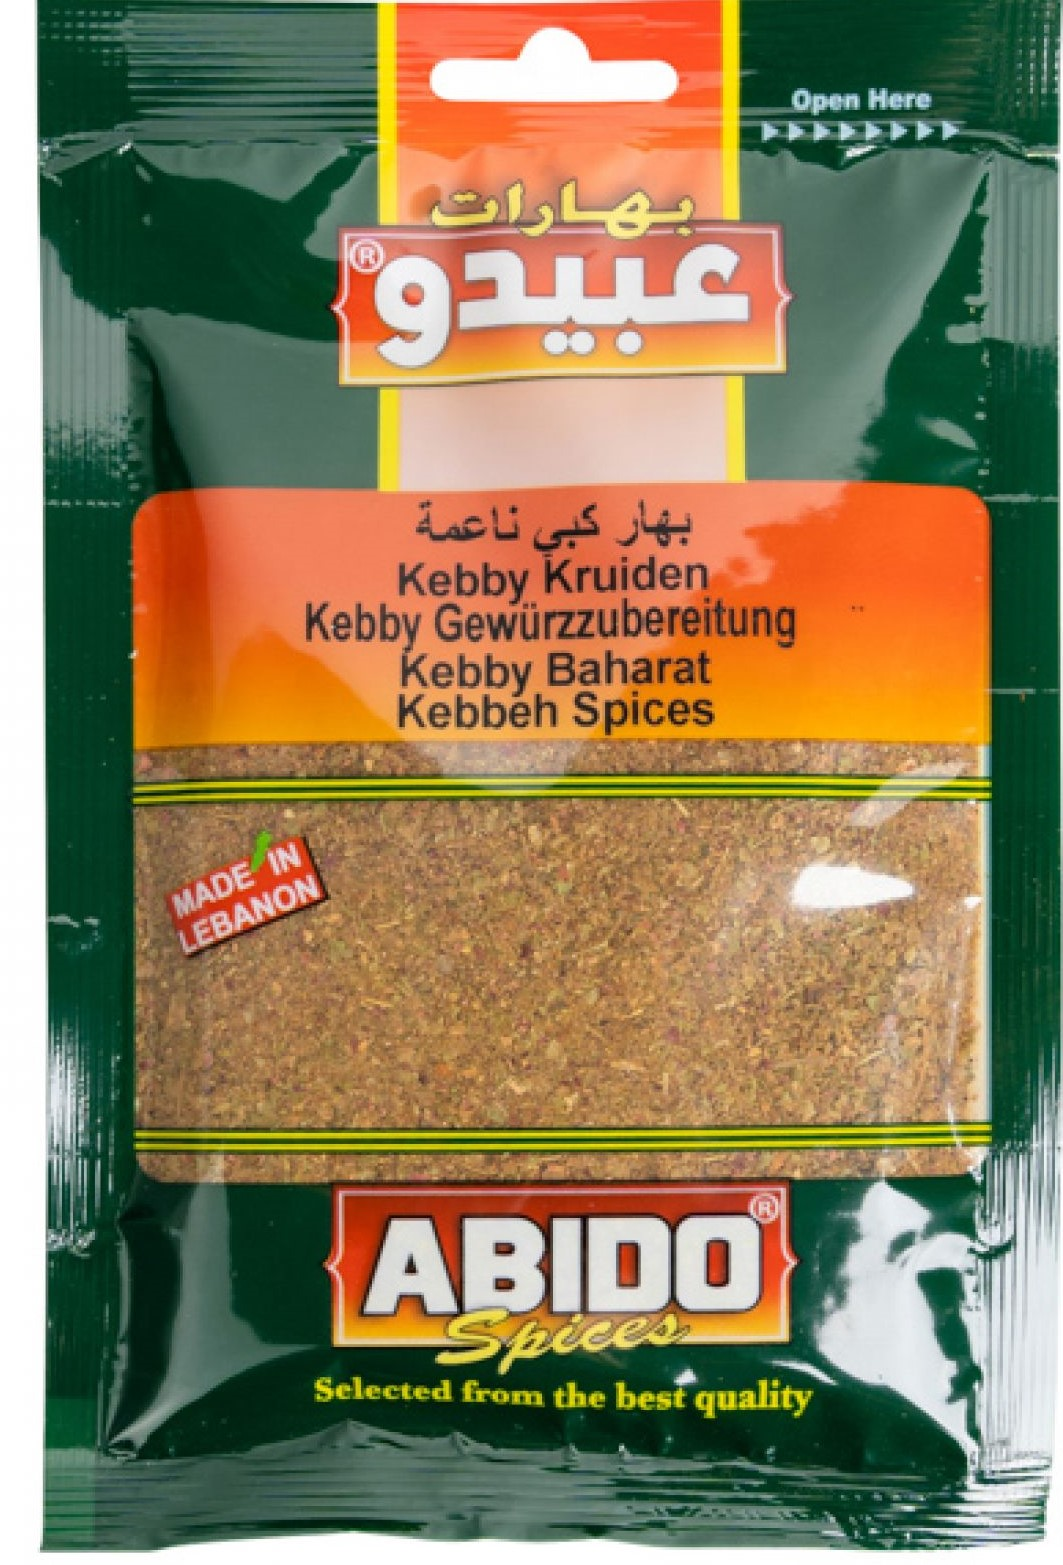 Abido Kibbe Gewürz Fein/Lebanon 50g